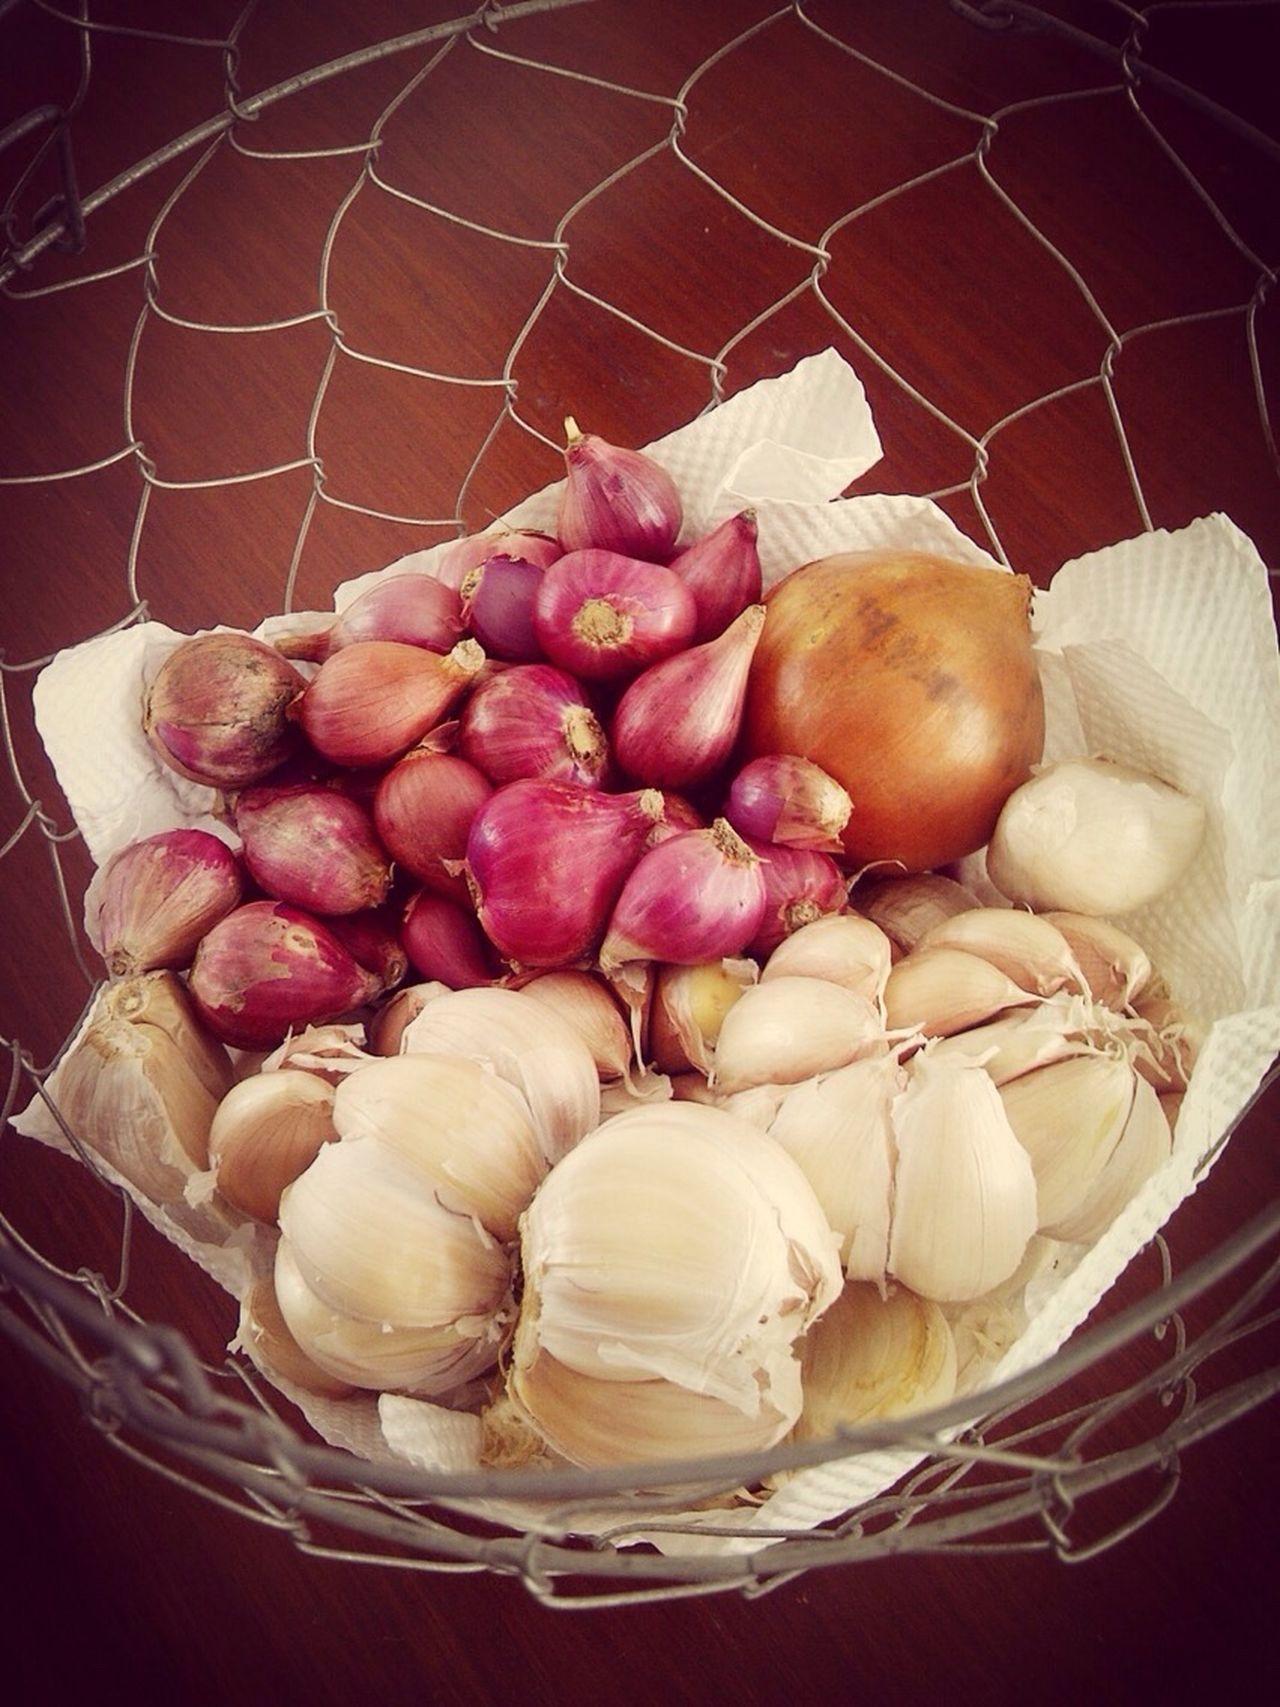 Onions Ingredients Kitchen Story Dapurdiam Fresh Reddish Garlic Clove